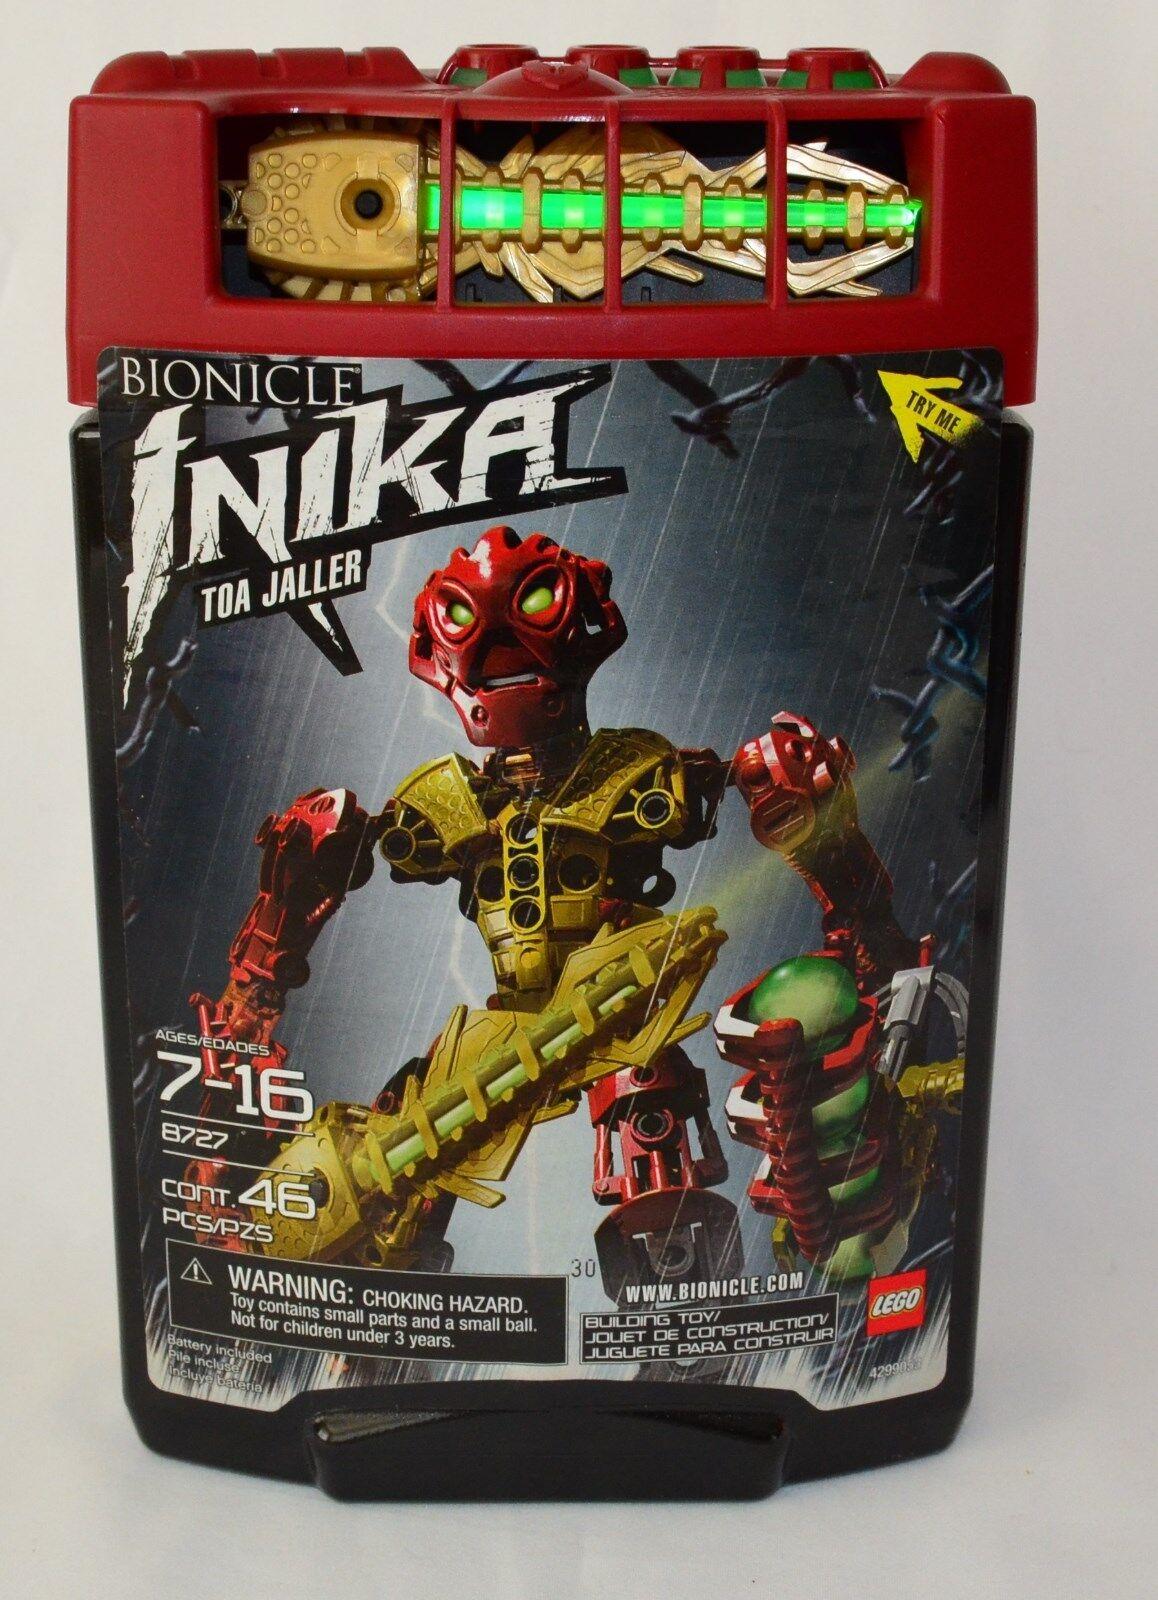 in vendita Lego Bionicle Bionicle Bionicle Toa Inika Toa Jtuttier (8727) Bre nuovo Sealed & gratuito Shipping  caldo